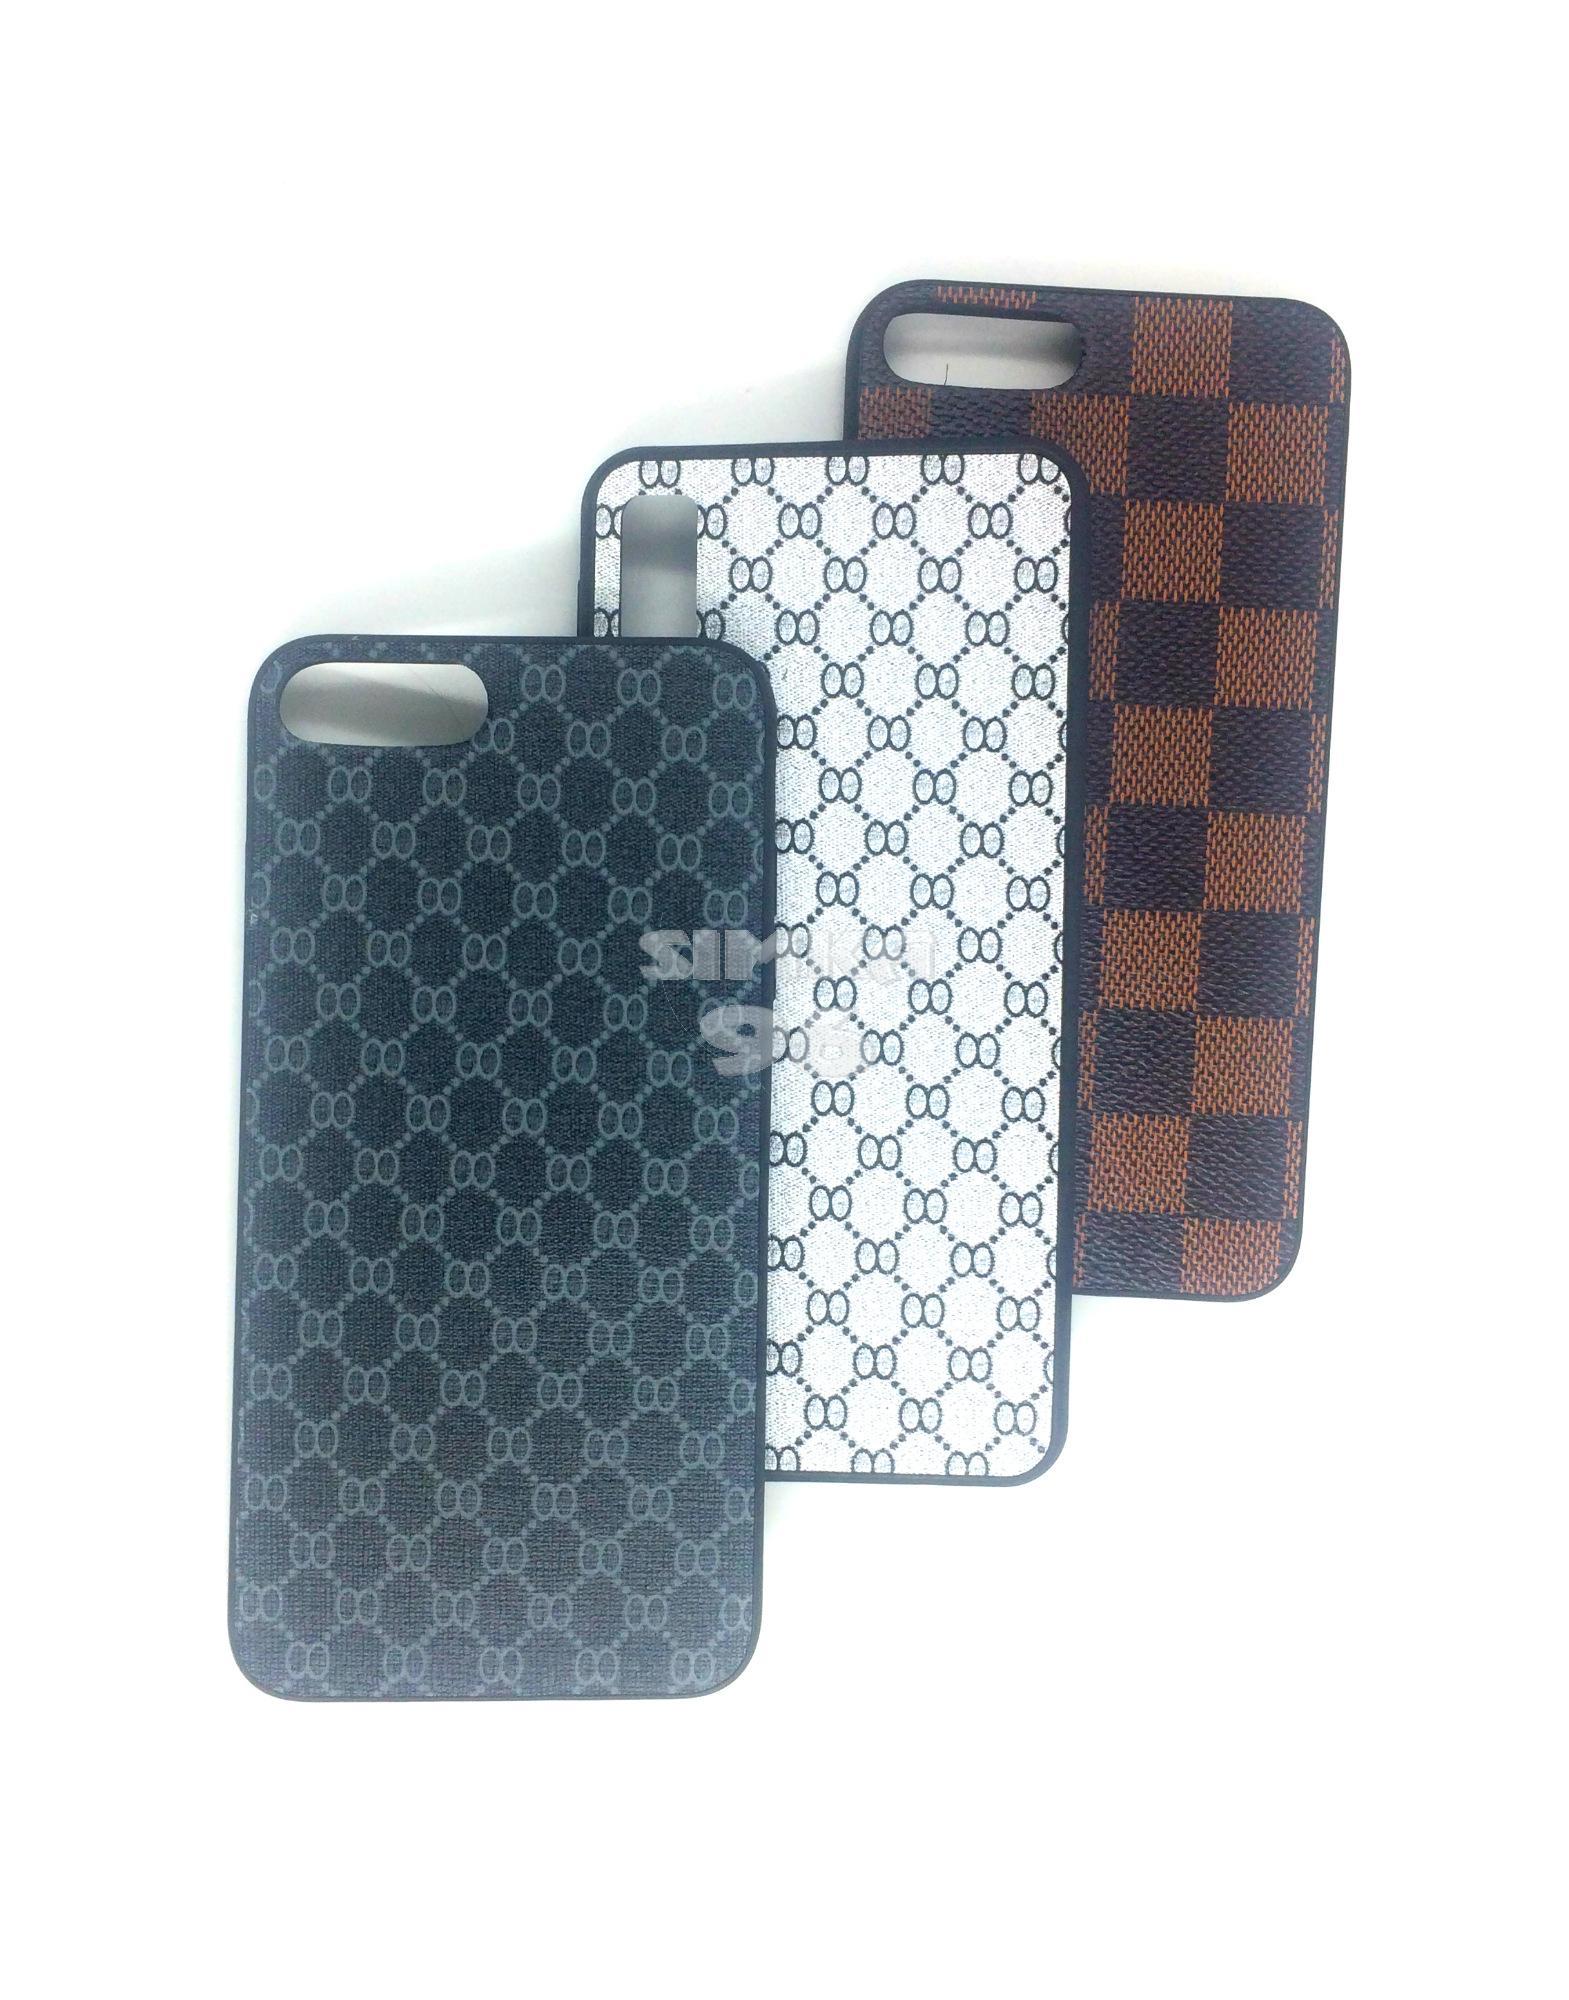 Чехол задник для iPhone Хs MAX силикон геометрия